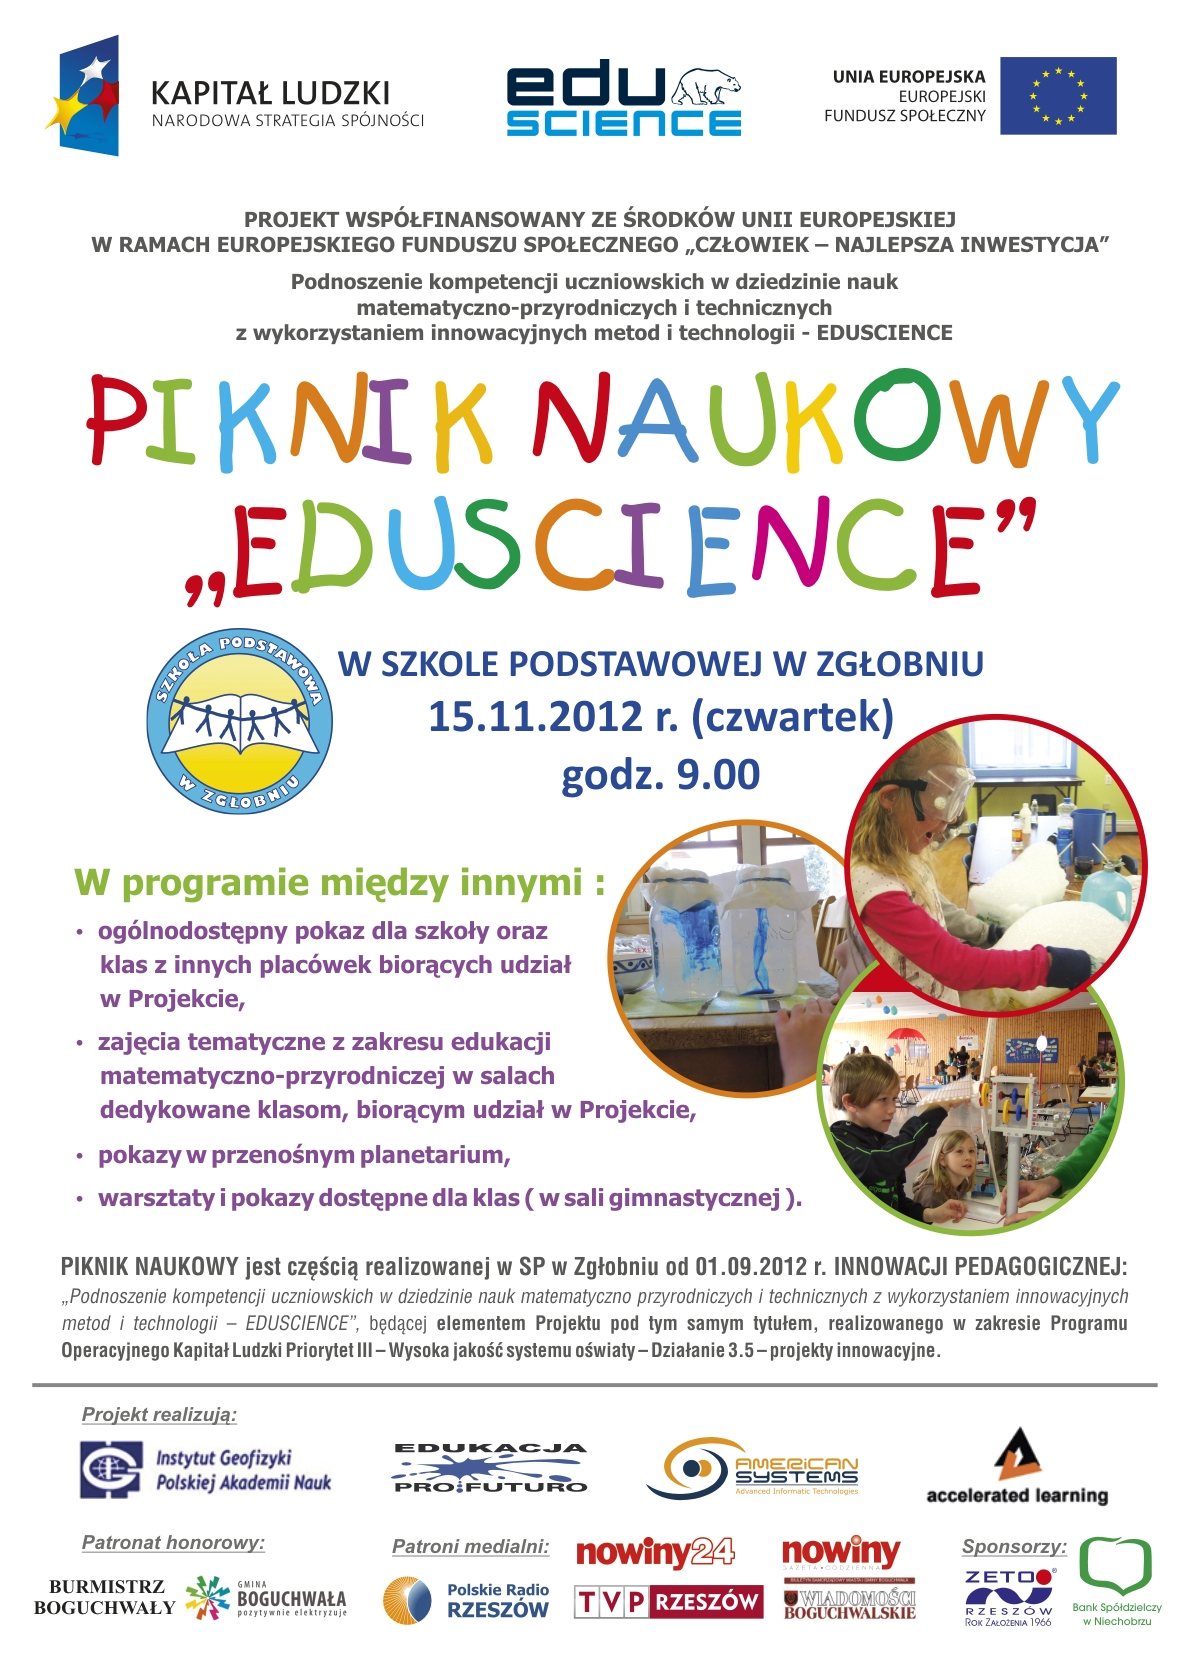 "Piknik naukowo-edukacyjny ""EDUSCIENCE"""